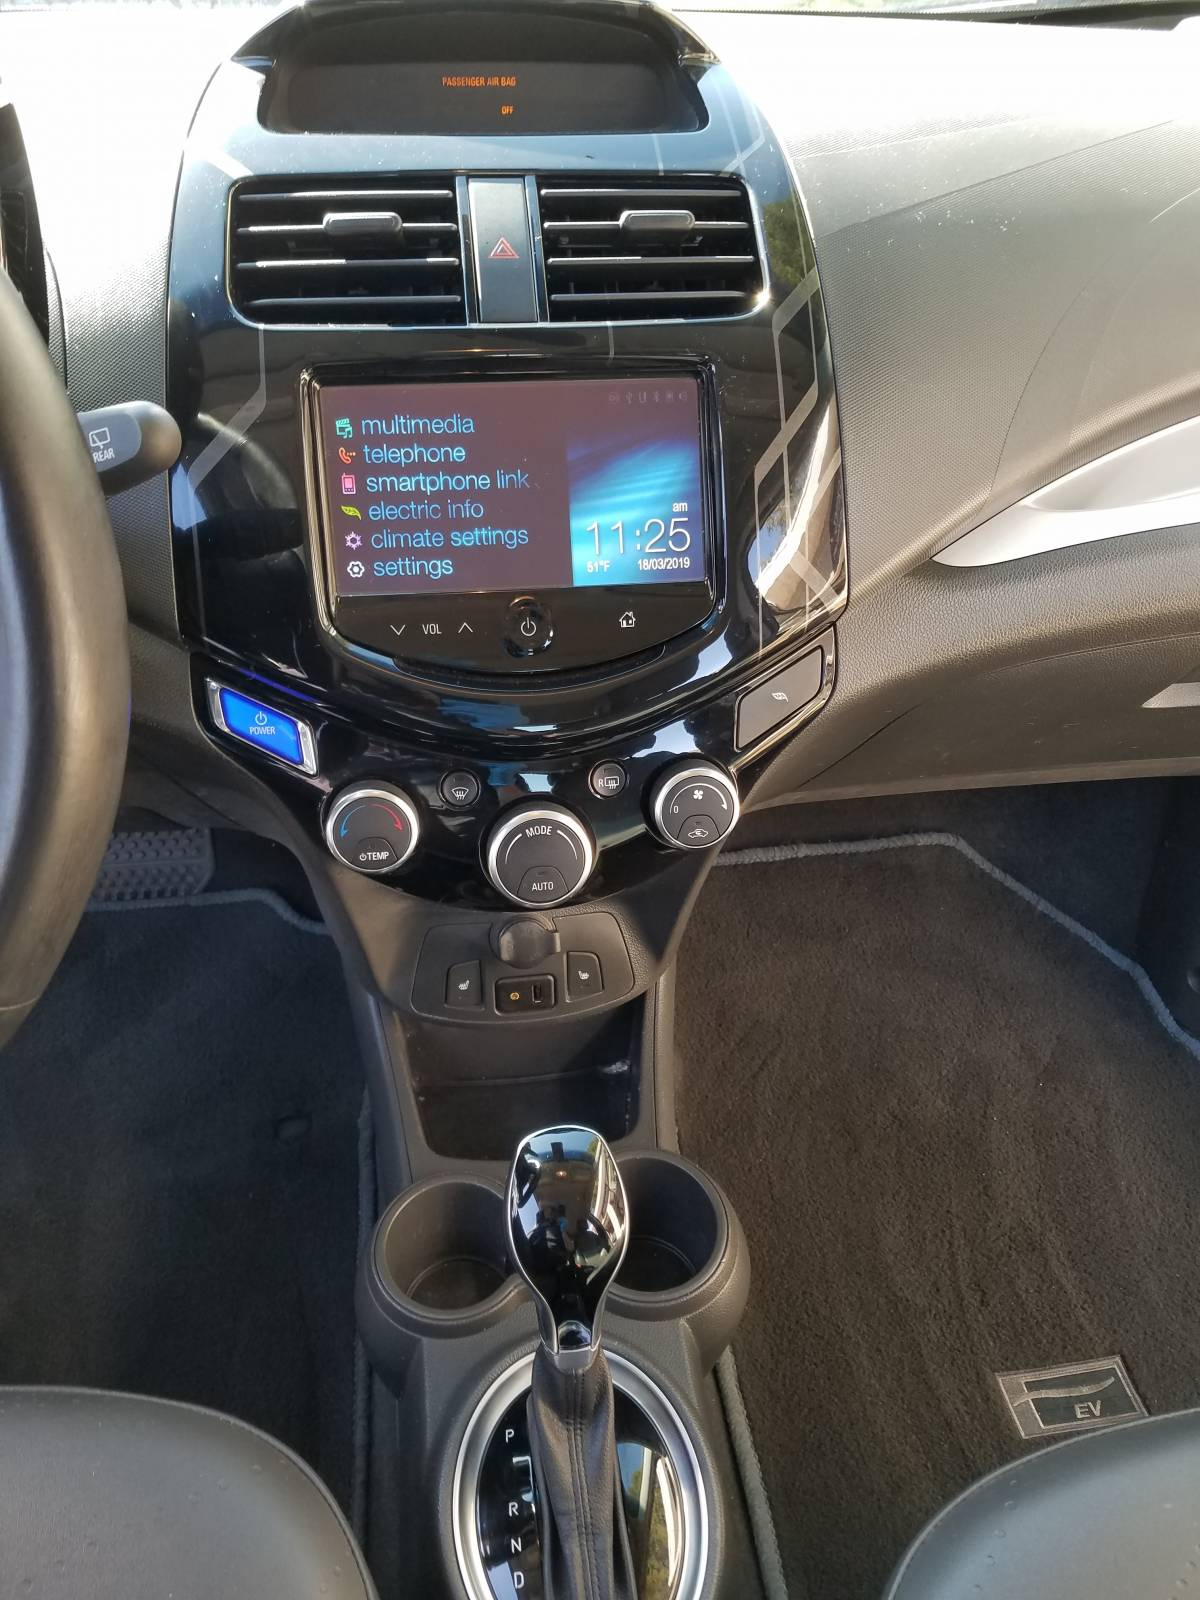 2015 Chevrolet Spark KL8CL6S08FC763792